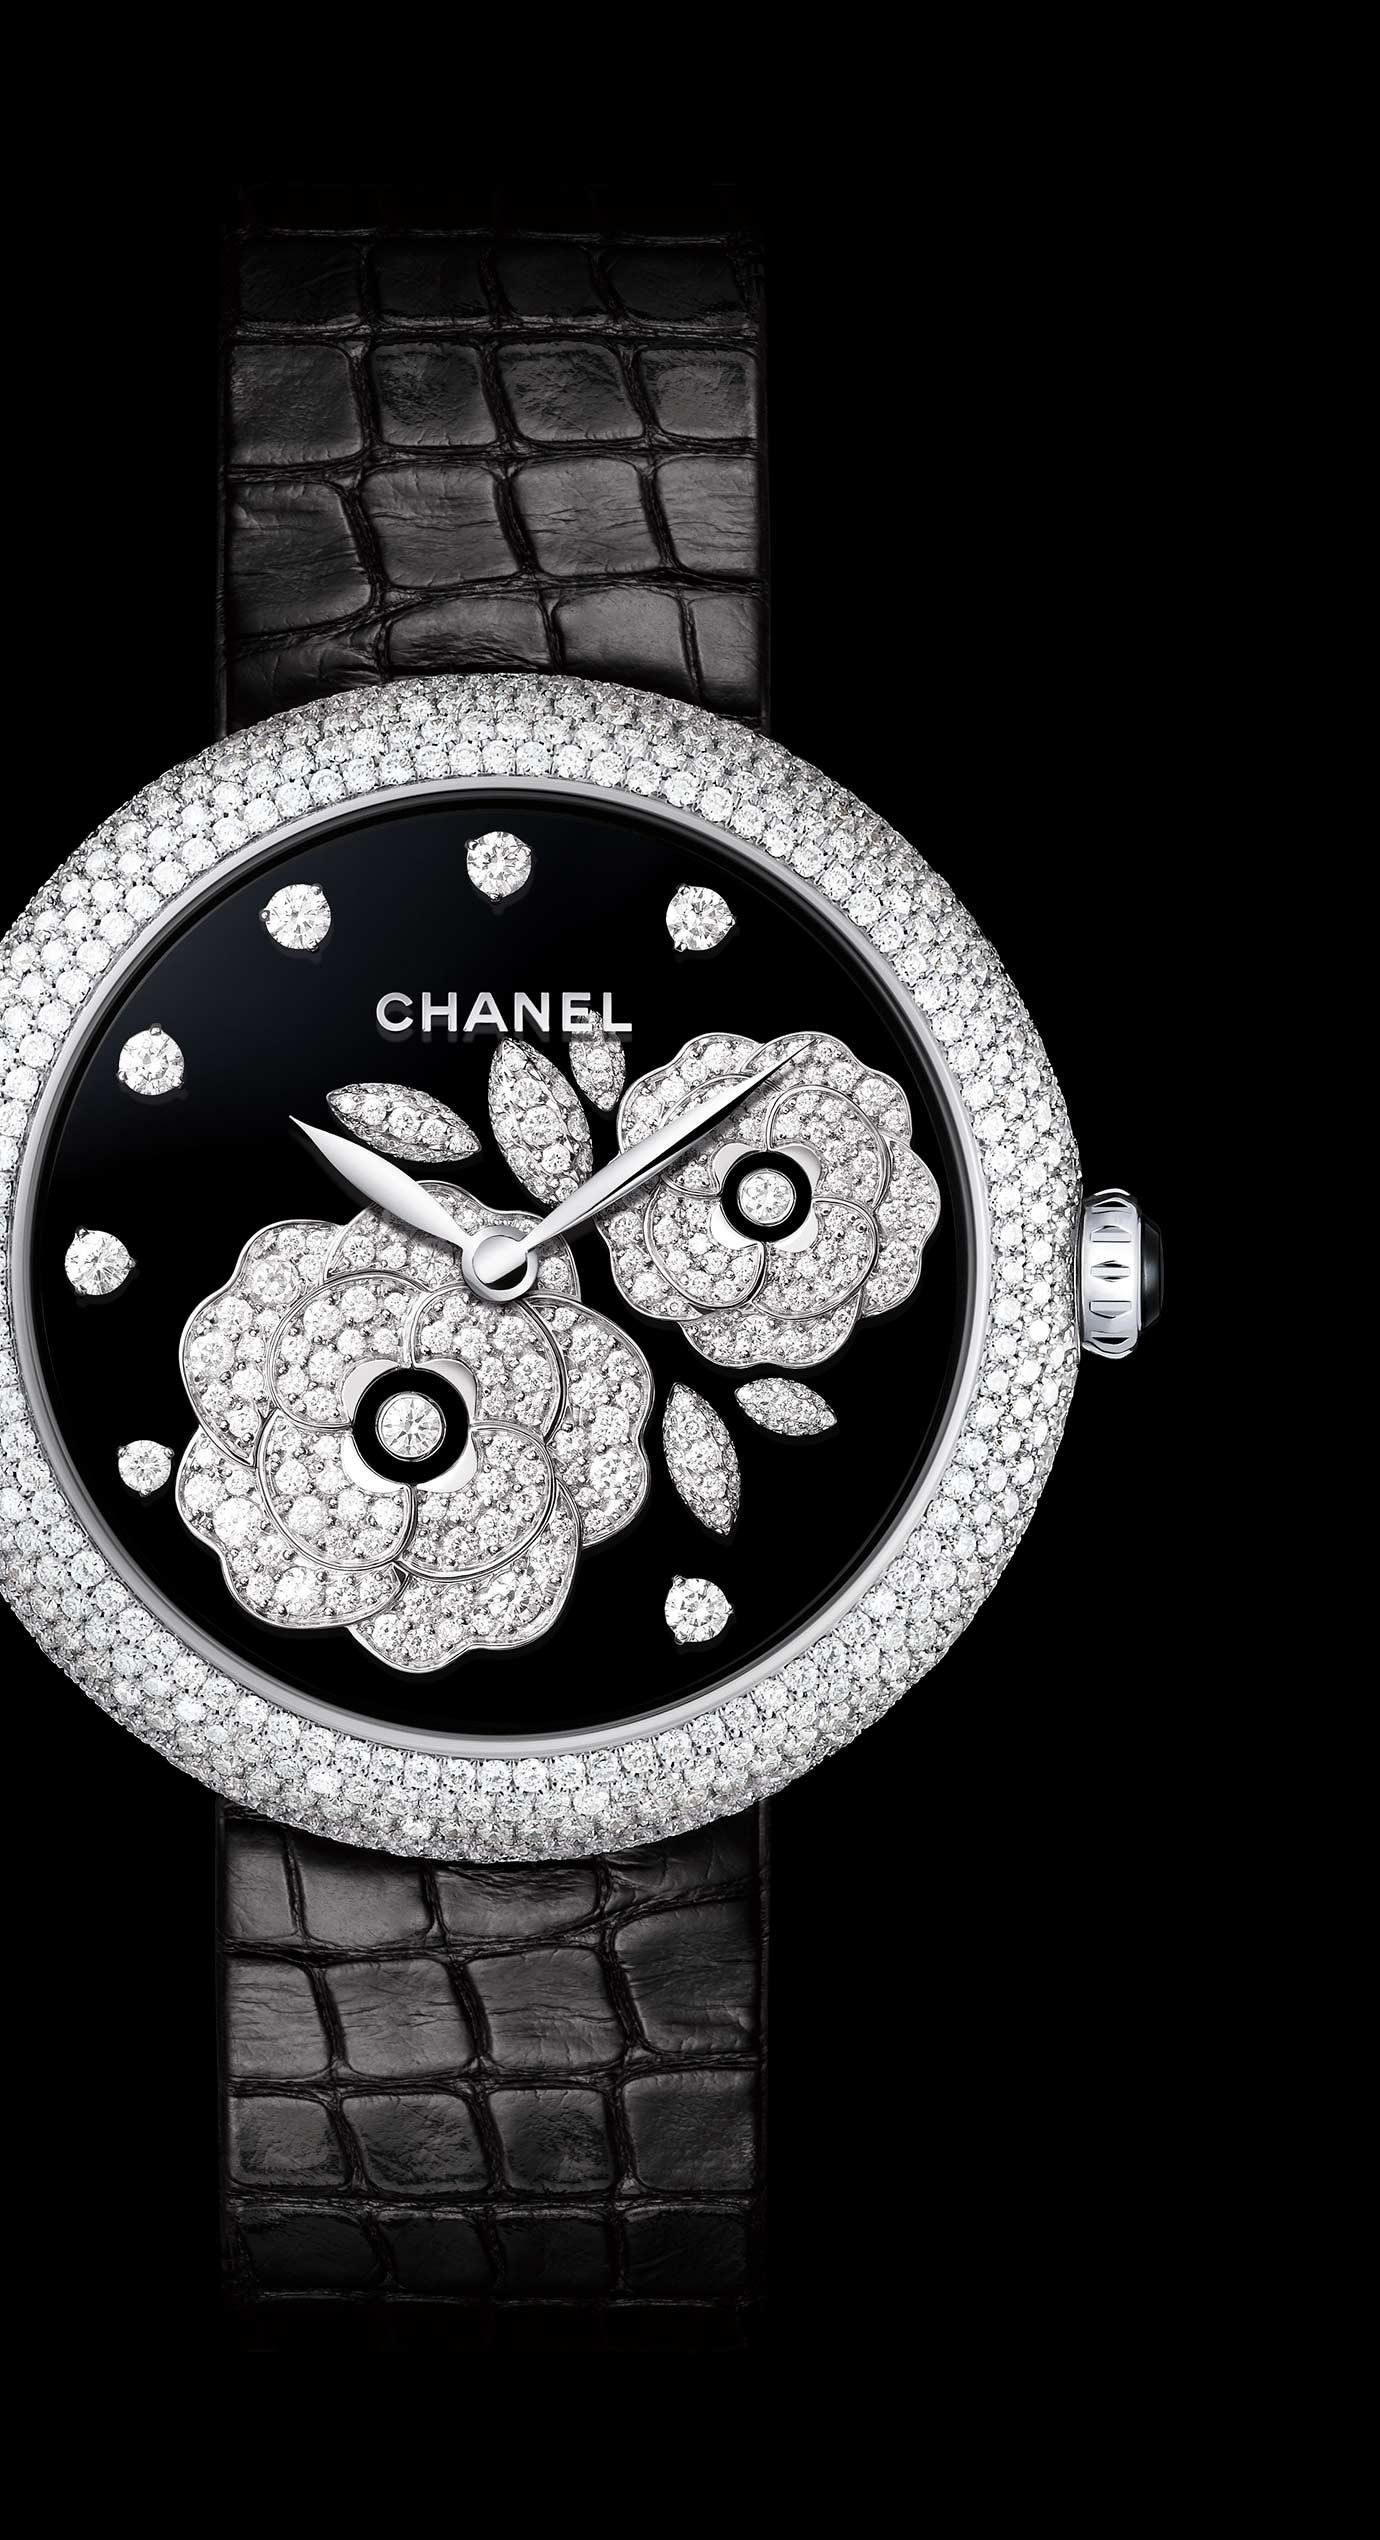 Reloj Mademoiselle Privé Joyería Bouton de Camélia - Esmalte Grand Feu negro y diamantes - Vista ampliada